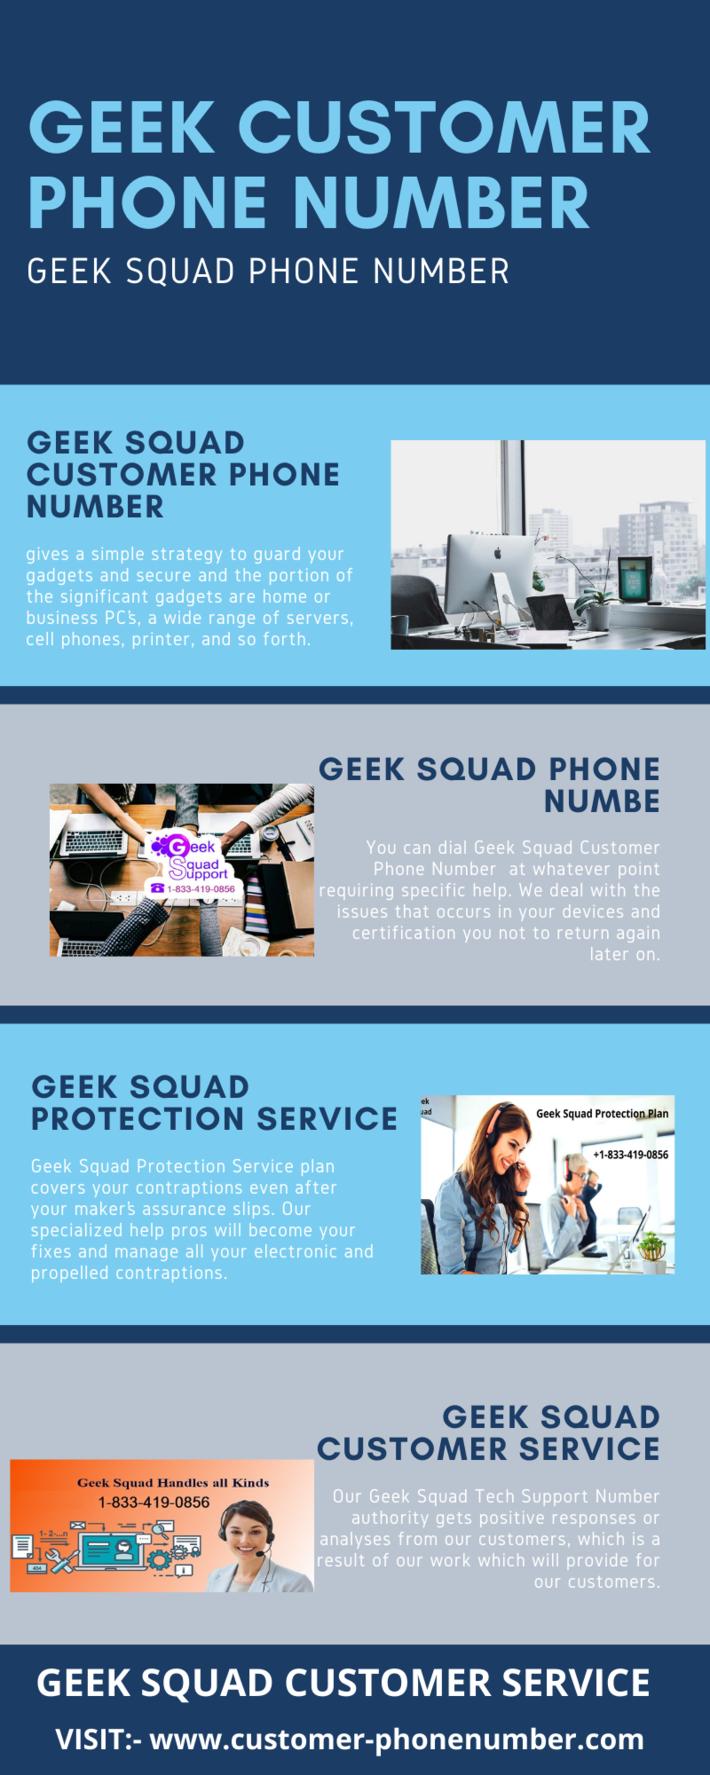 Geek Squad Customer Service USA